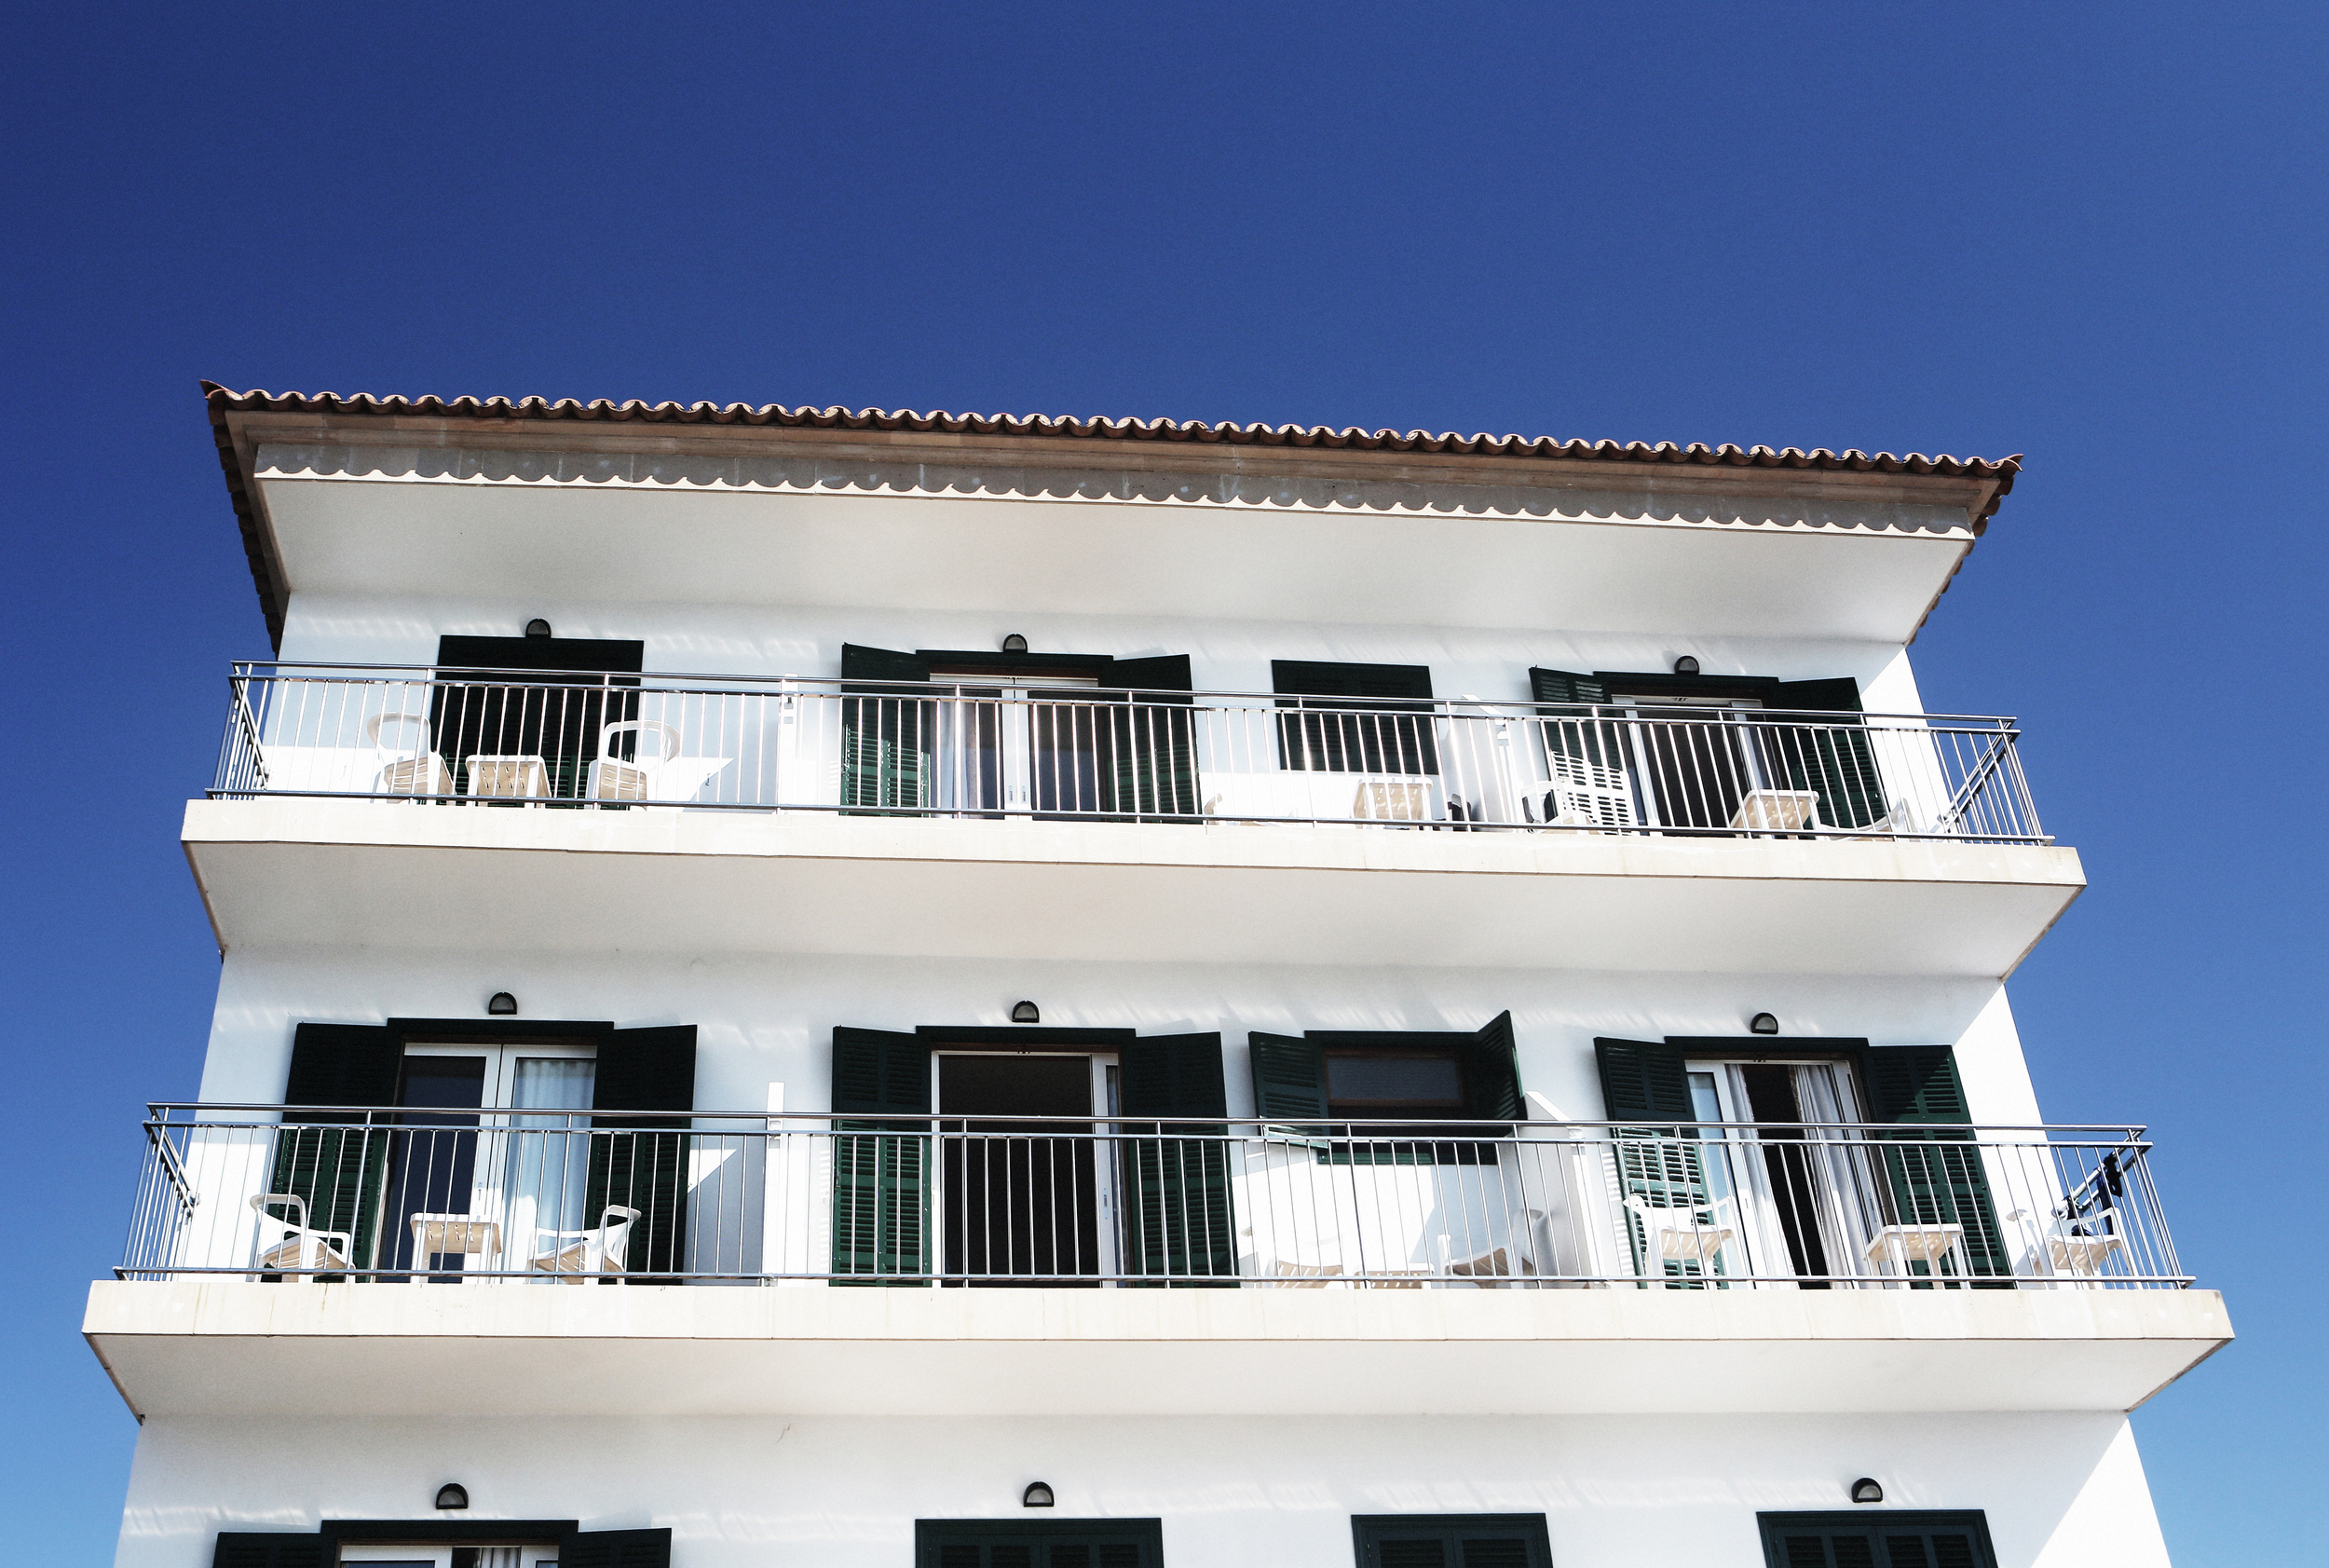 life-of-pix-free-stock-photos-palma-fruits-sun-apartments-white-building.jpg